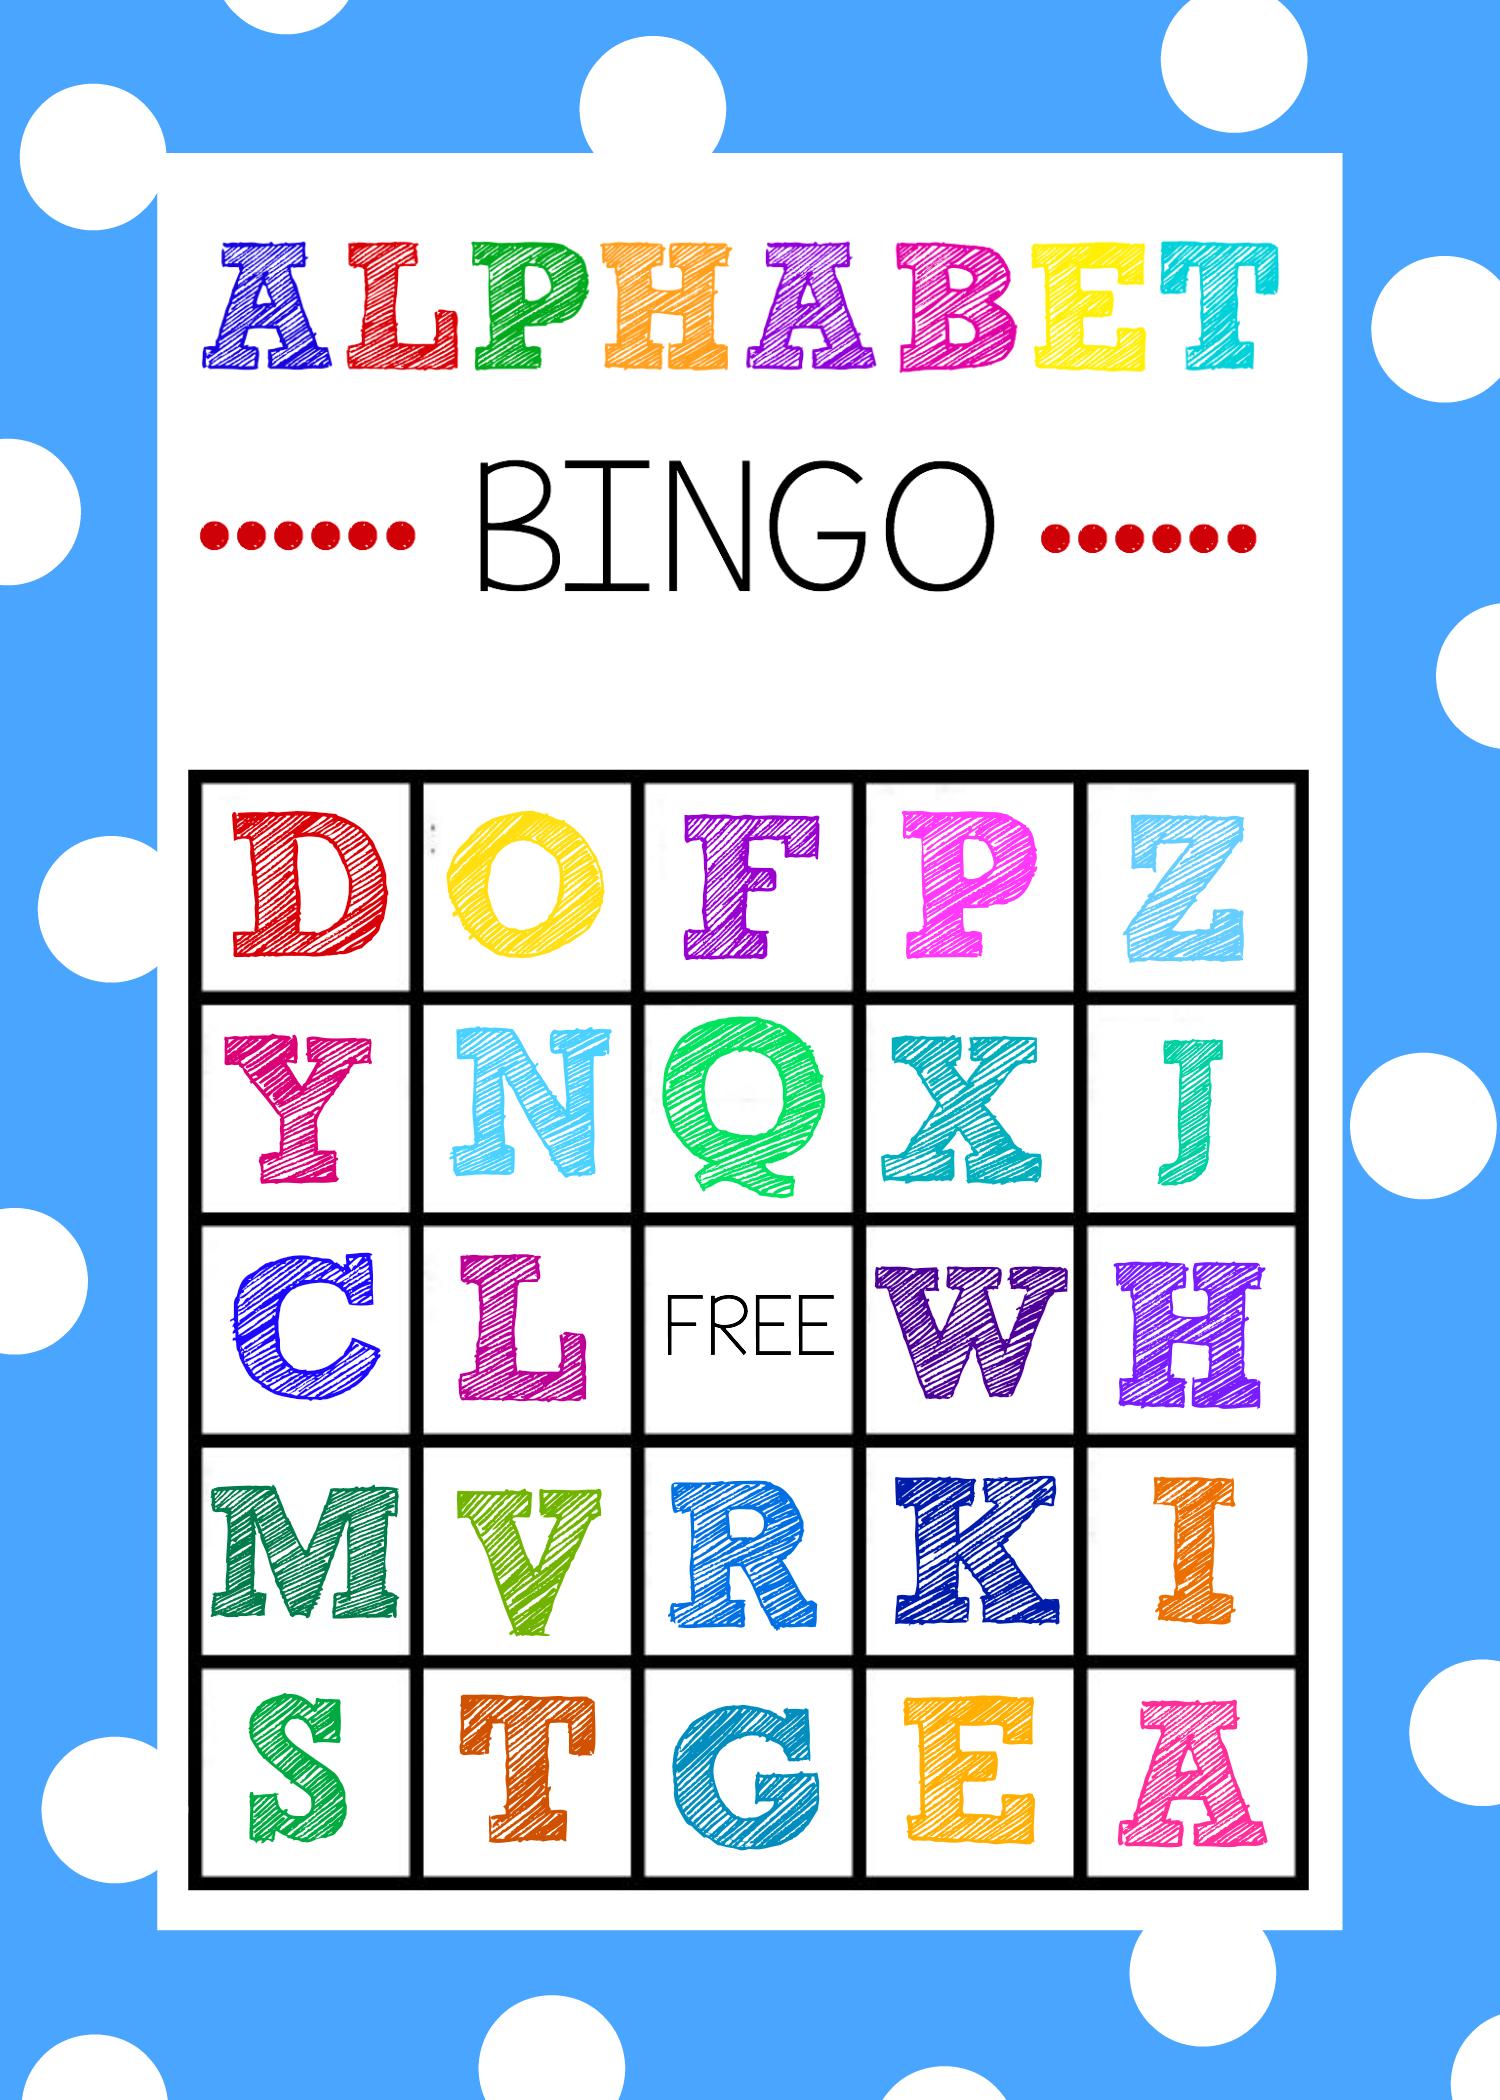 Free Alphabet Bingo Boards. Such A Fun Abc Game For Kids! | Abc - Free Printable Alphabet Games